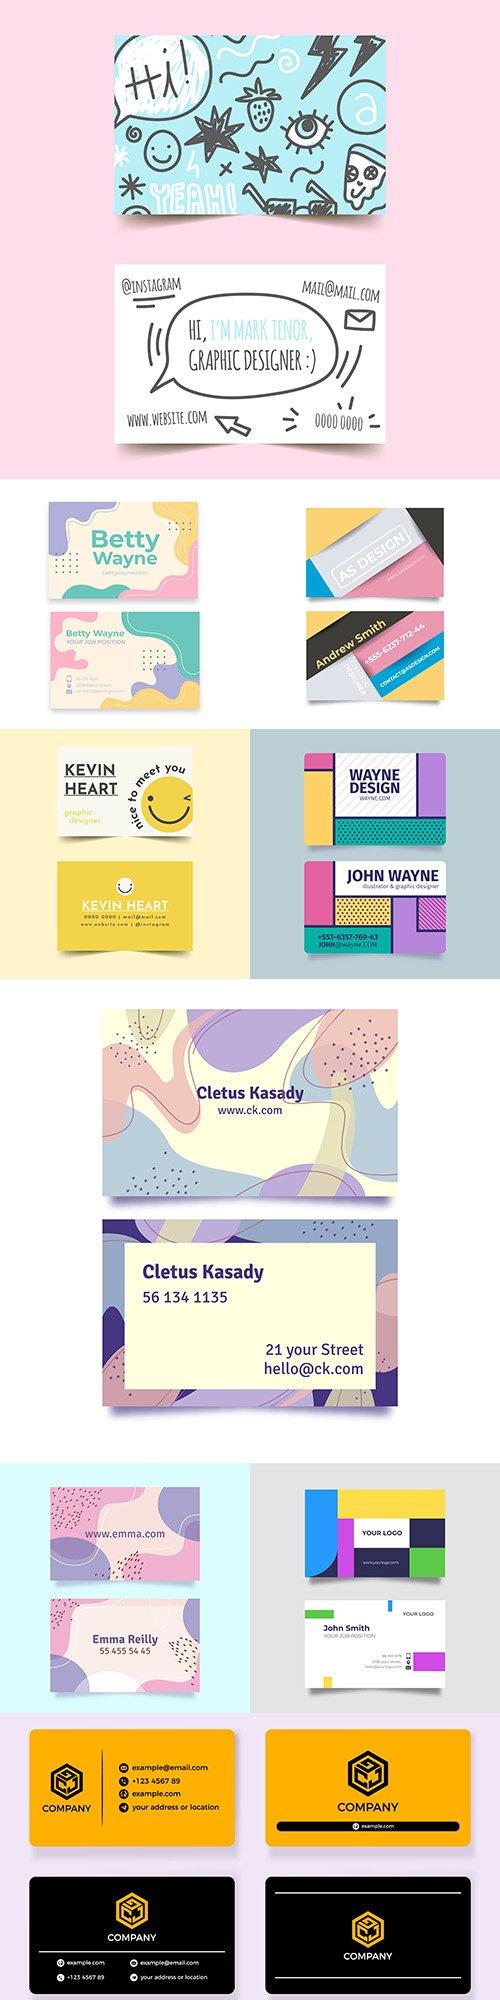 Business cards pastel gradient design template